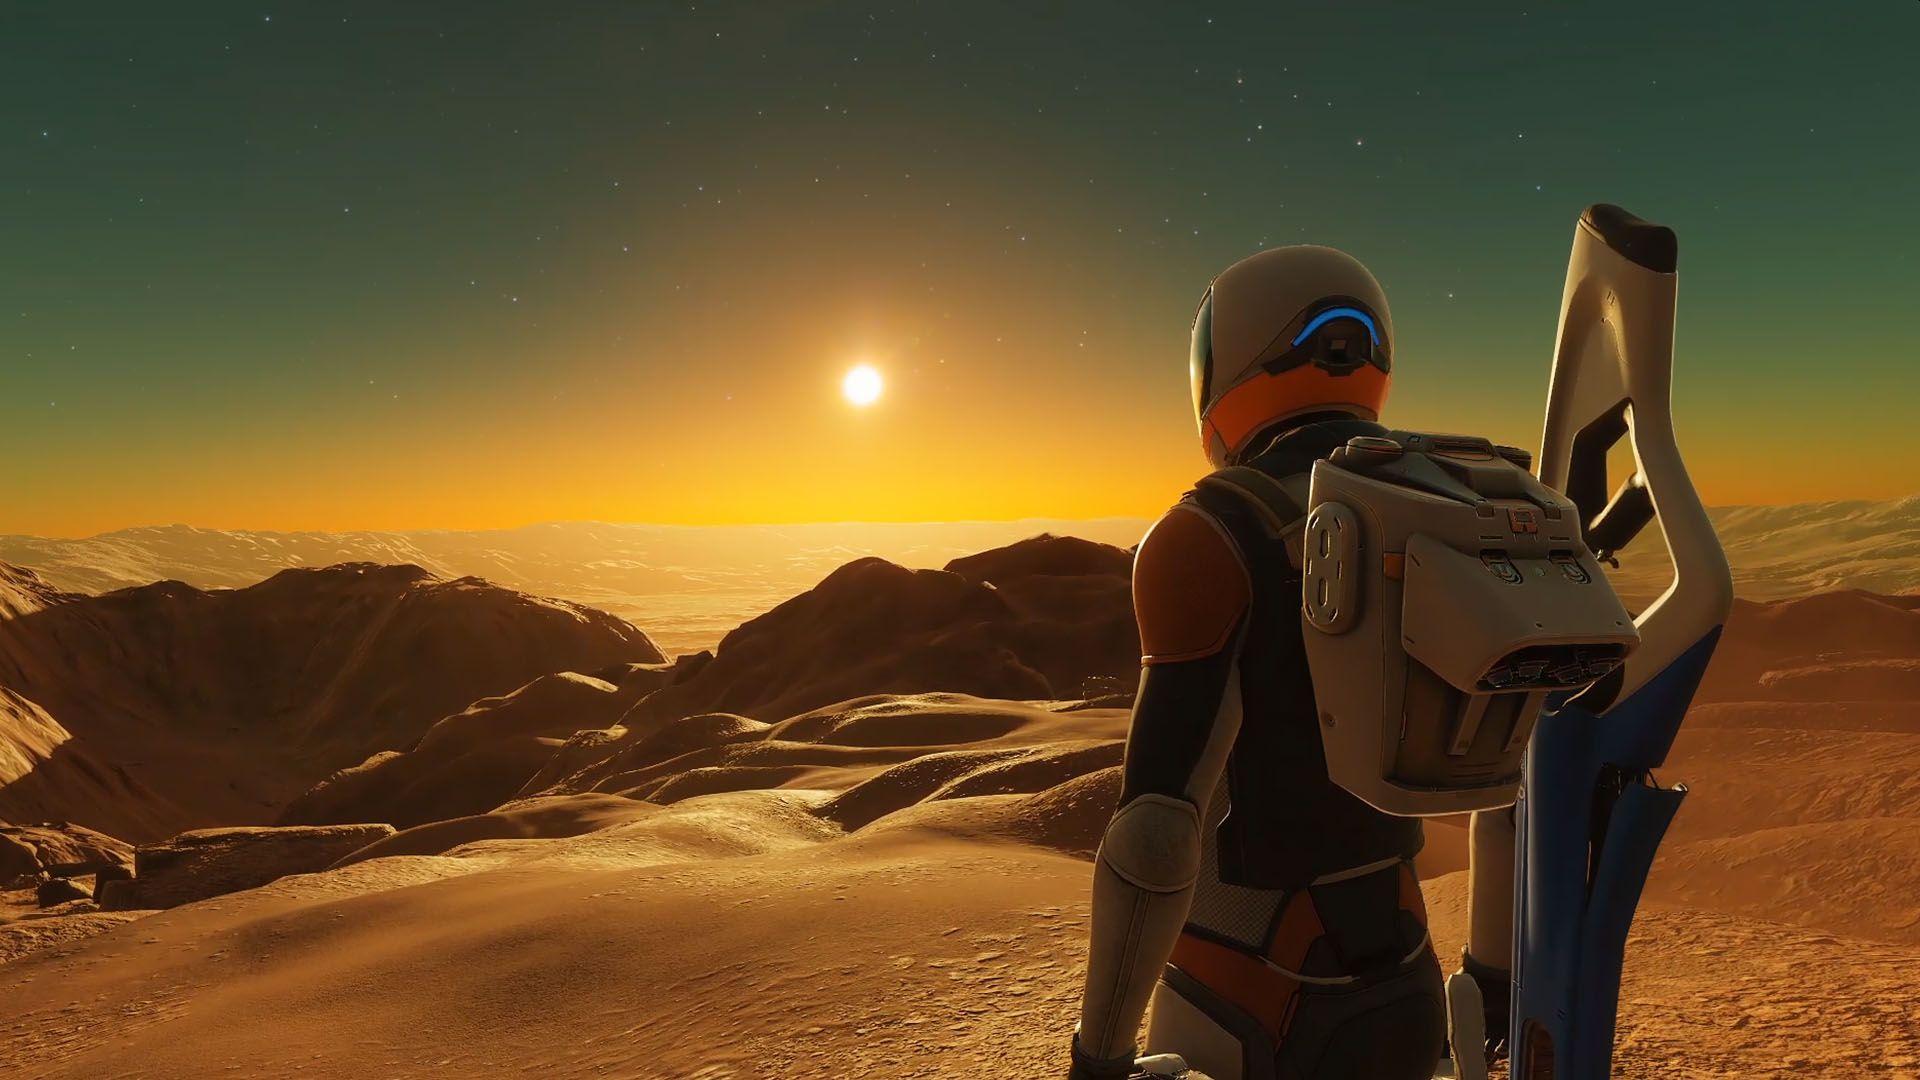 Elite Dangerous: Odyssey's first hotfix should improve stability